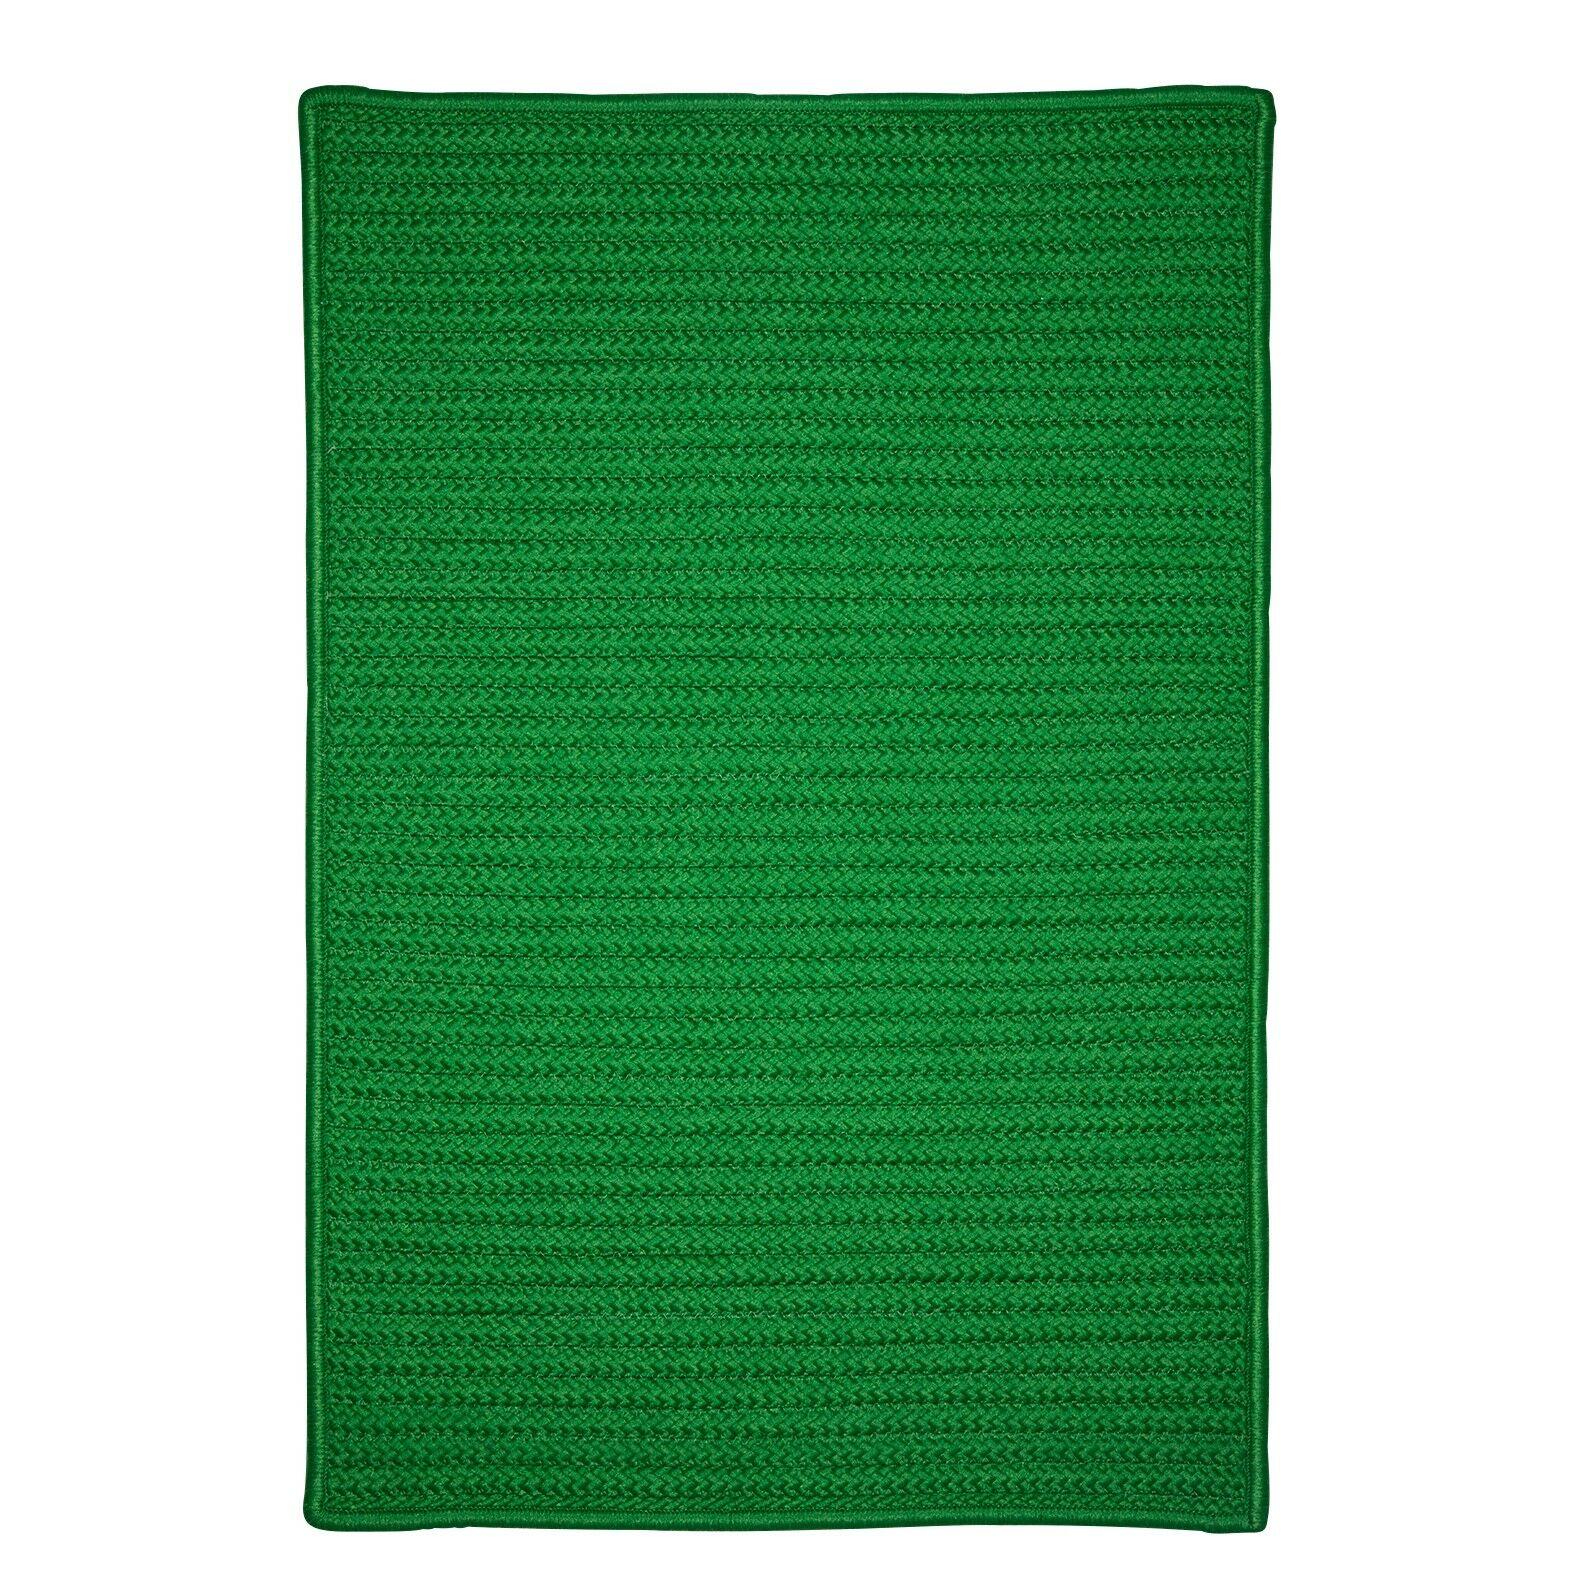 Glasgow Green Indoor/Outdoor Area Rug Rug Size: Rectangle 3' x 5'